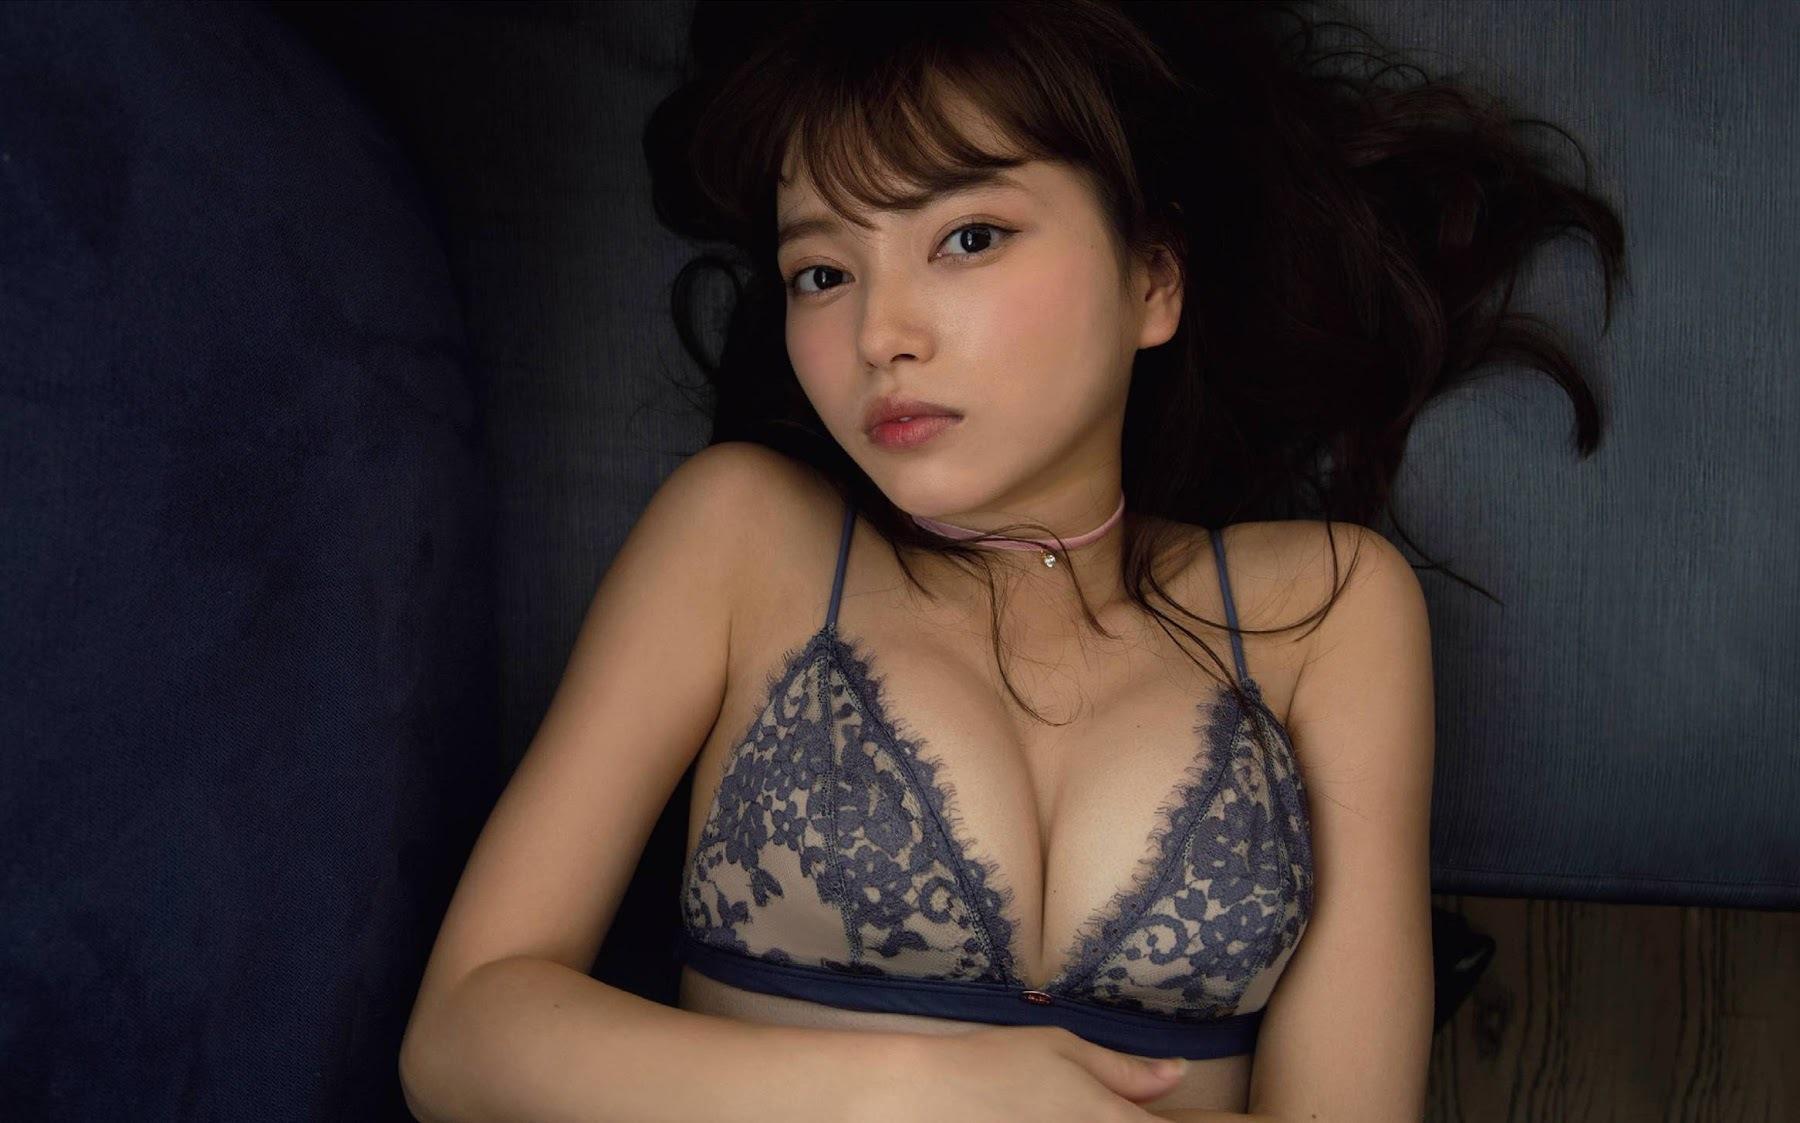 Provocative Lingerie Sayaka Komuro005